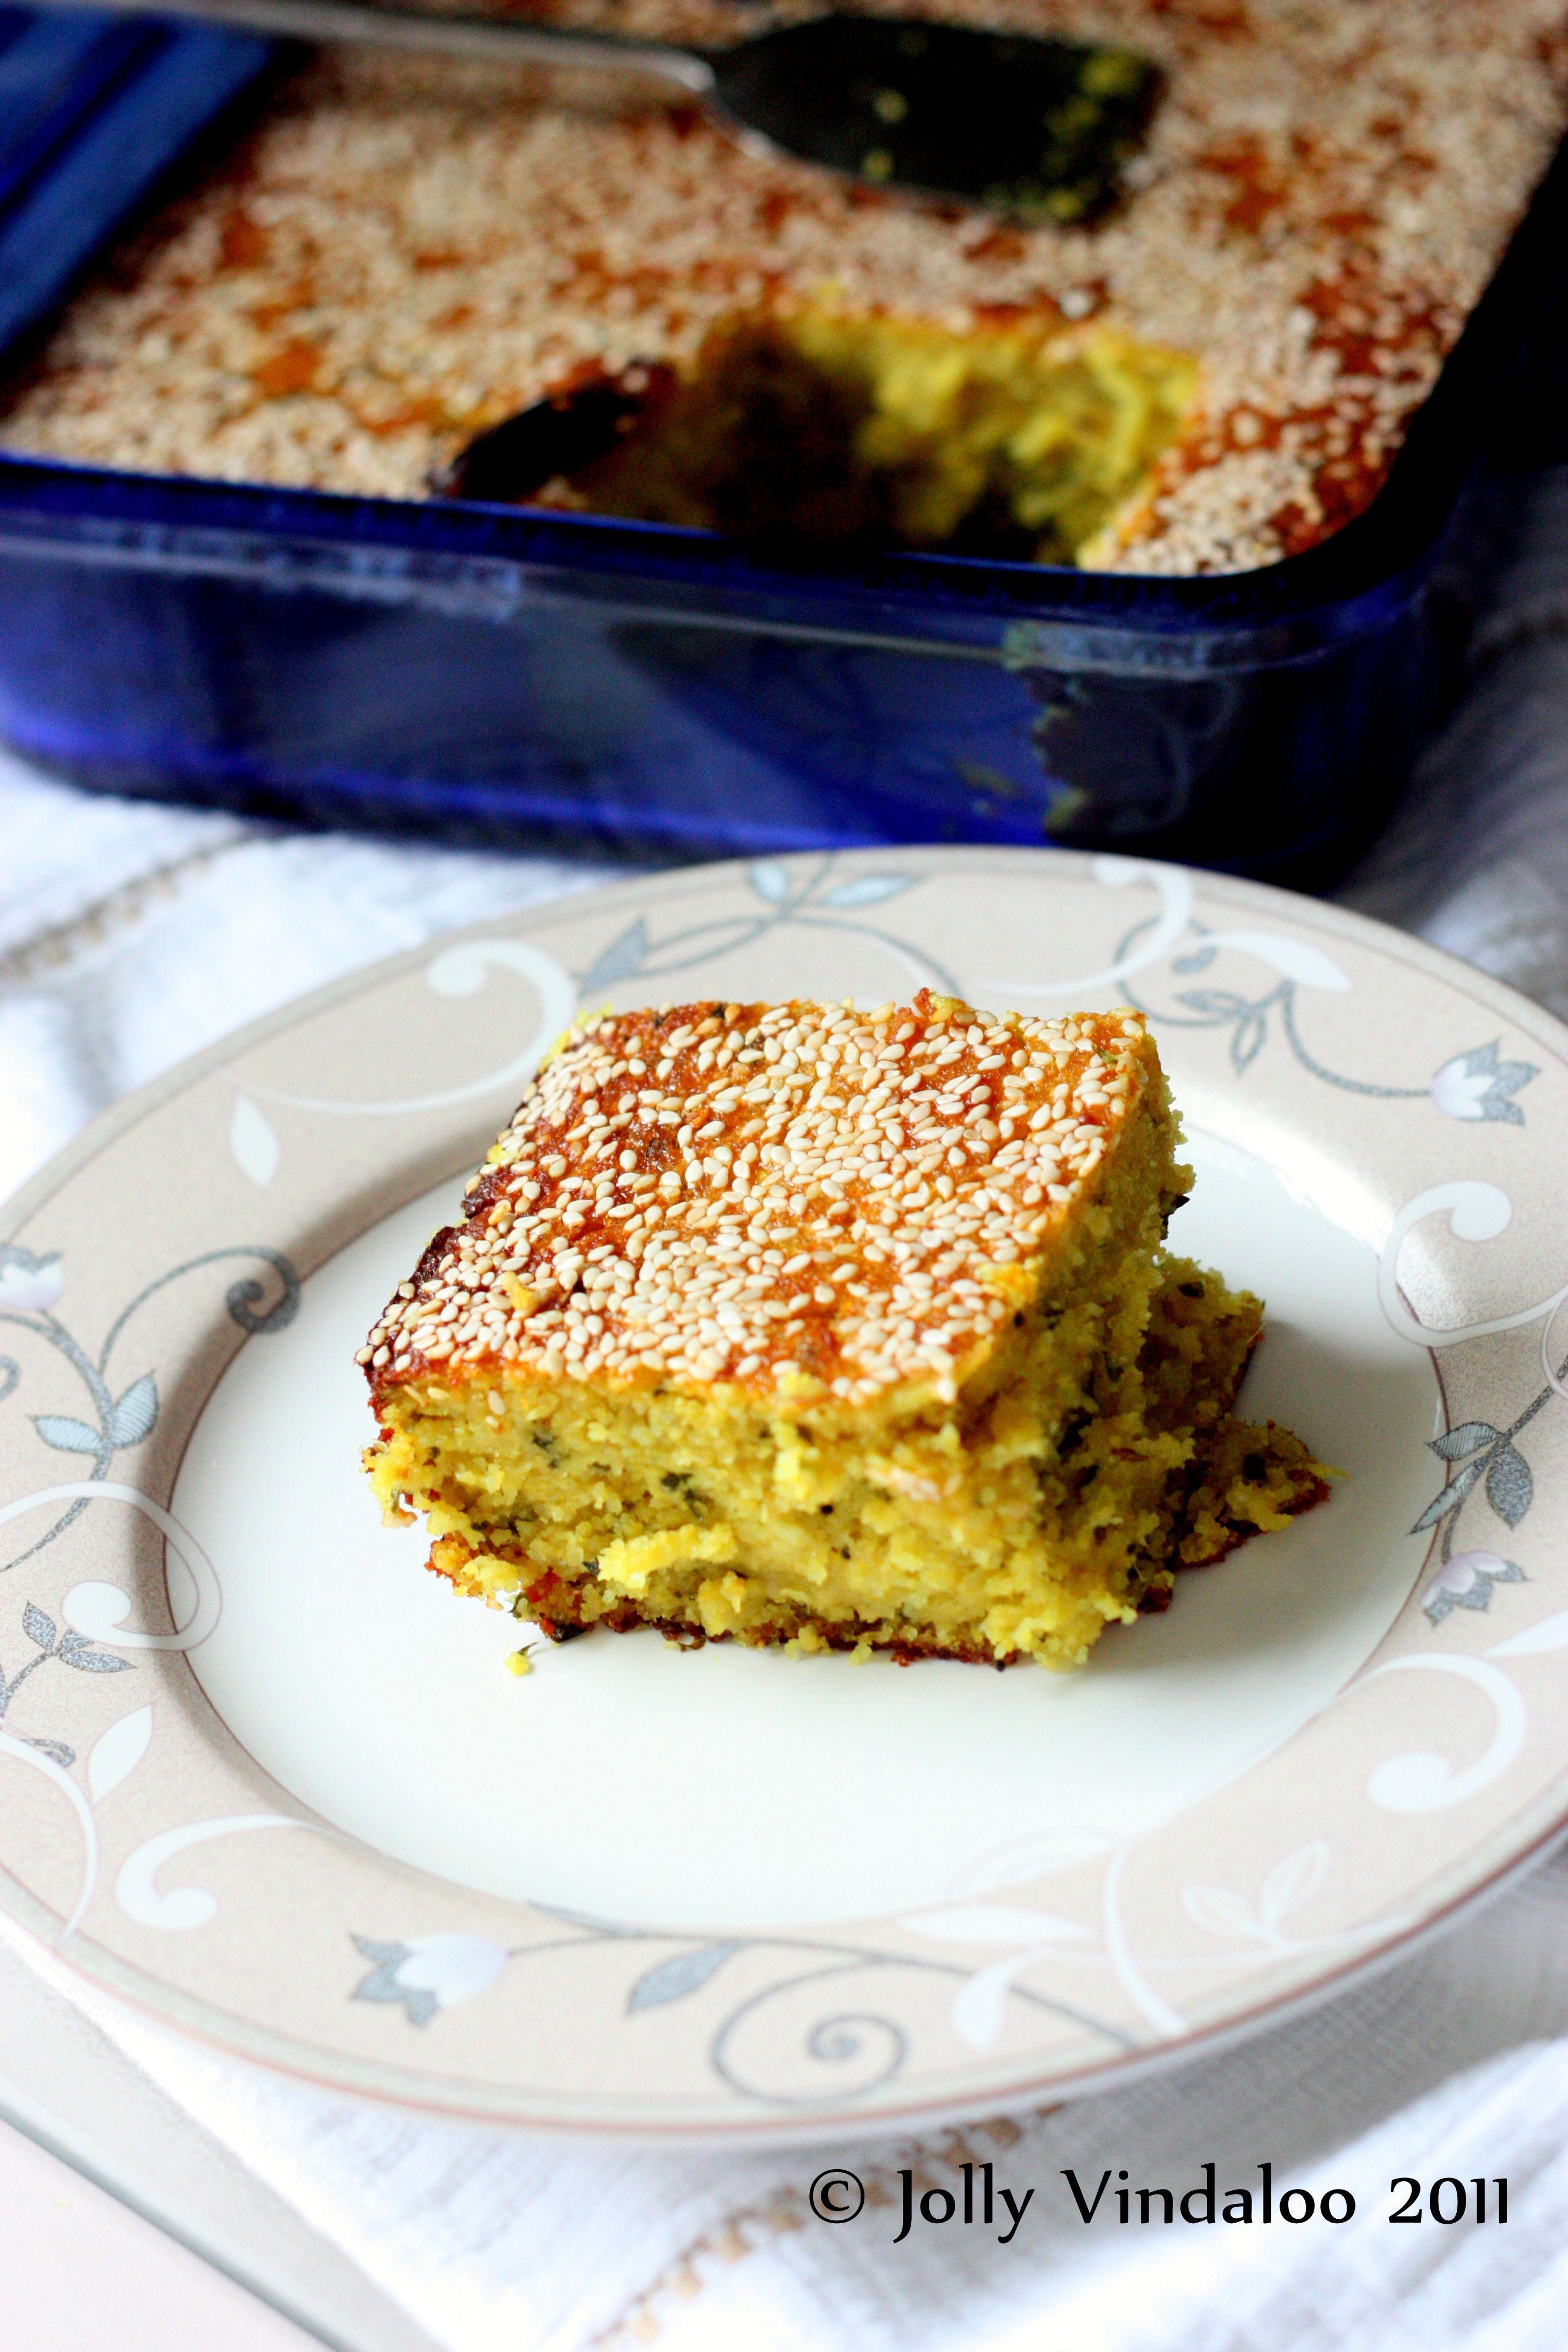 Handavahandvo snacks food and gujarati food handvo recipe in oven forumfinder Images